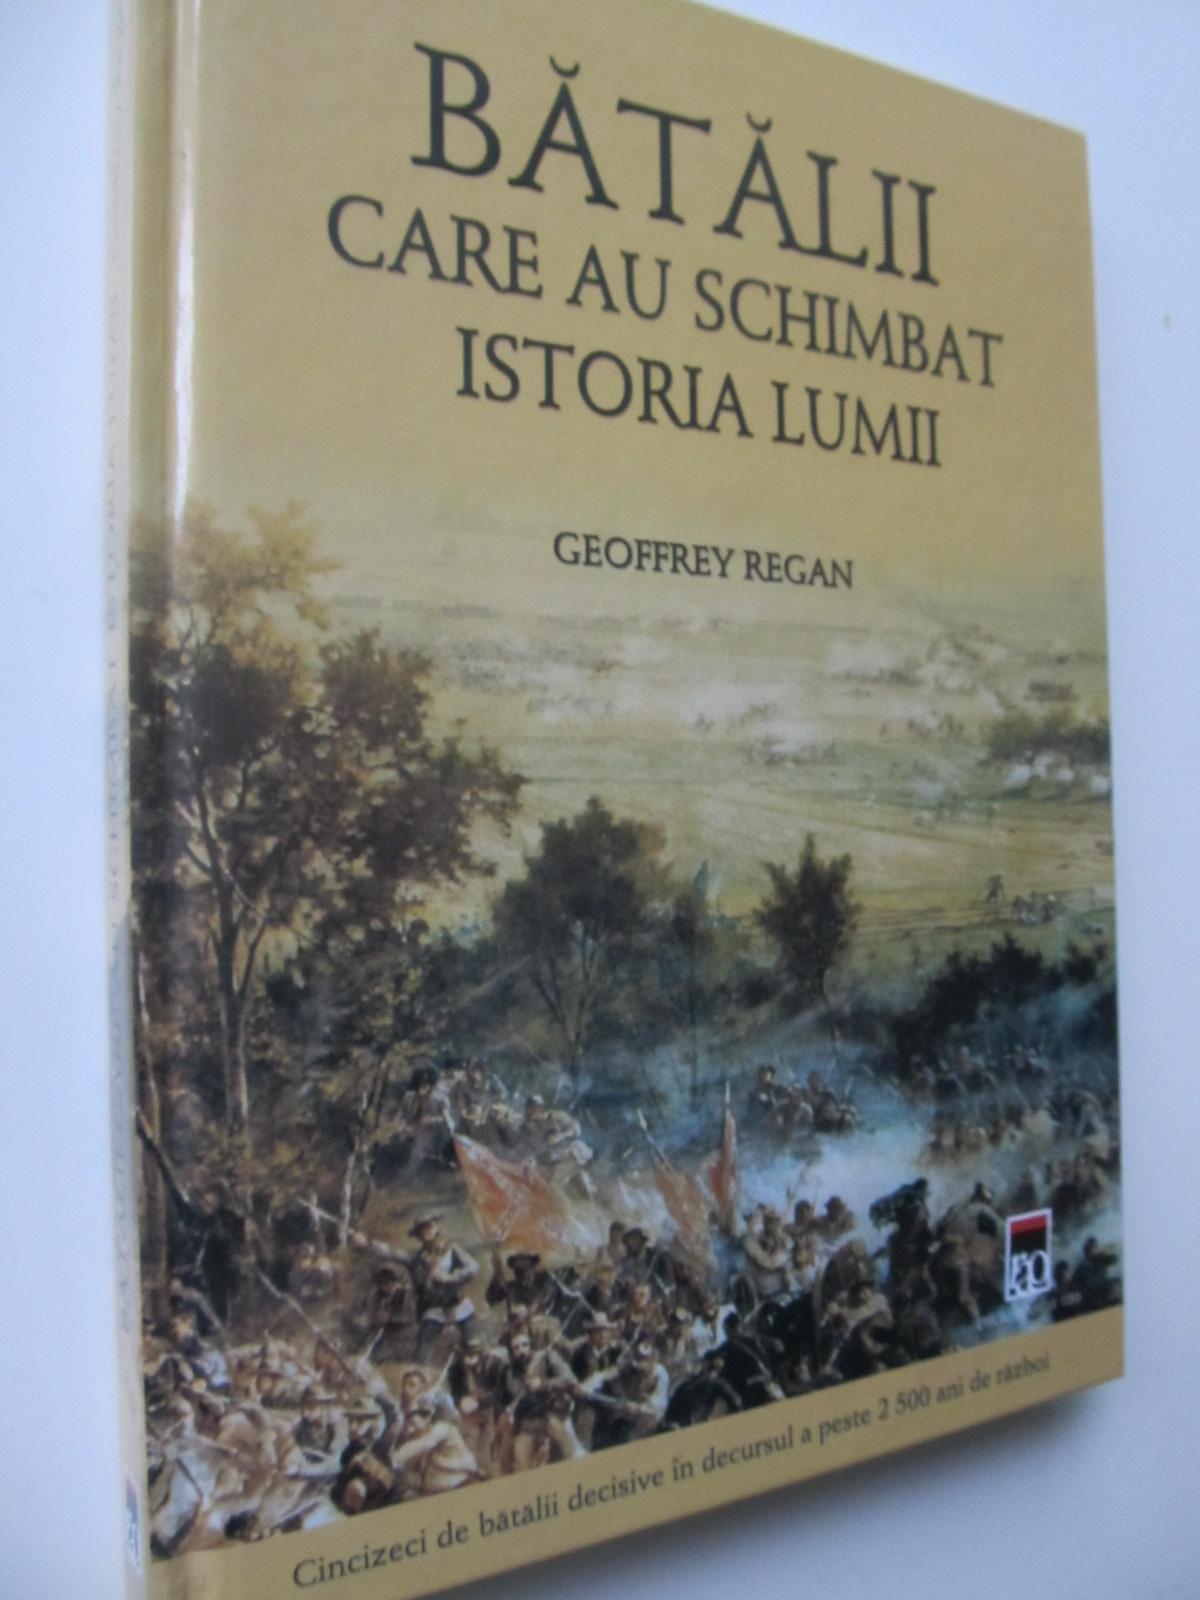 Batalii care au schimbat istoria lumii - Geoffrey Regan | Detalii carte